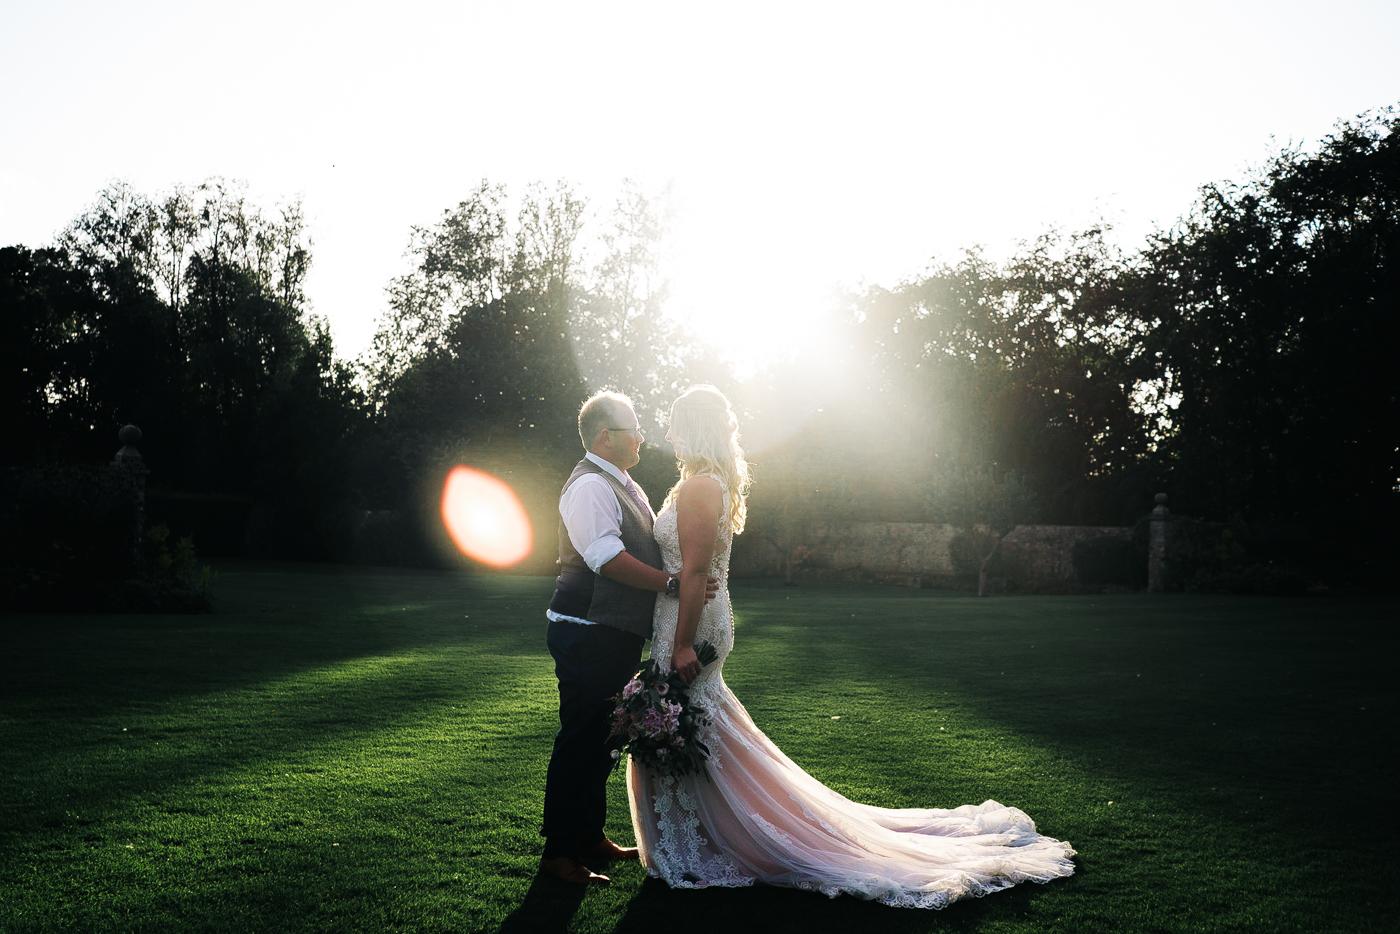 headlame-hall-north-yorkshire-north-east-photographer-wedding-0042.jpg